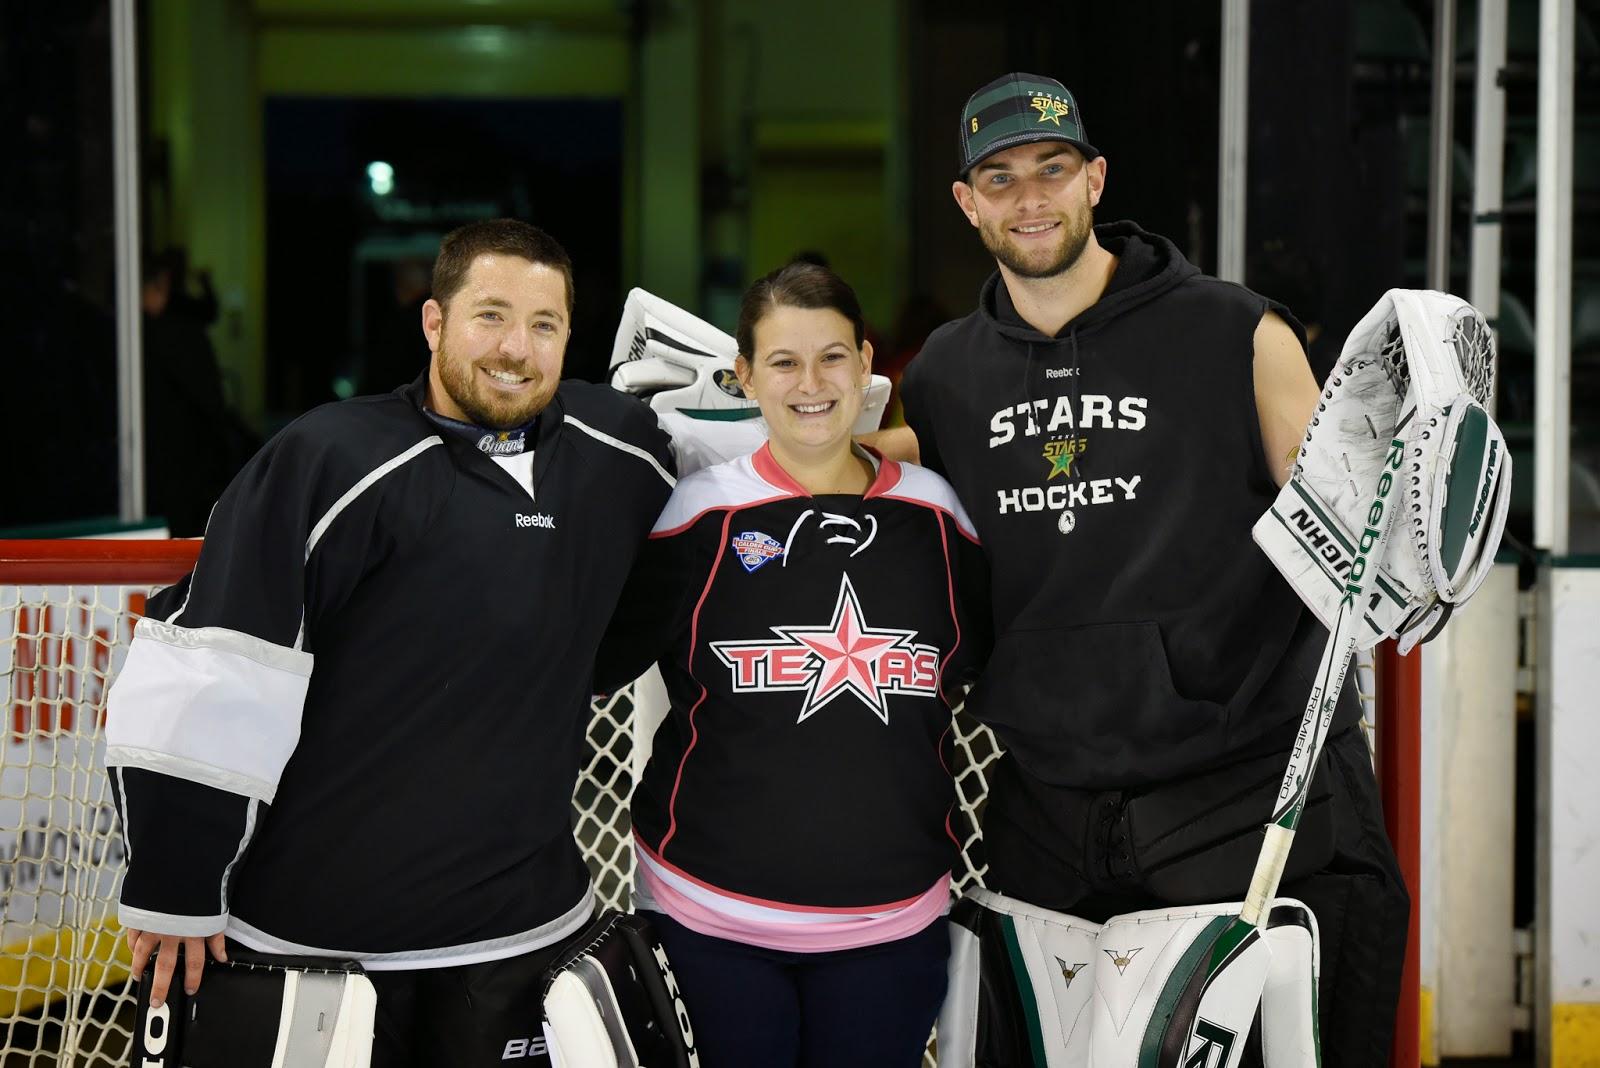 36460d6b1 100 Degree Hockey - Texas Stars Hockey News  March 2015